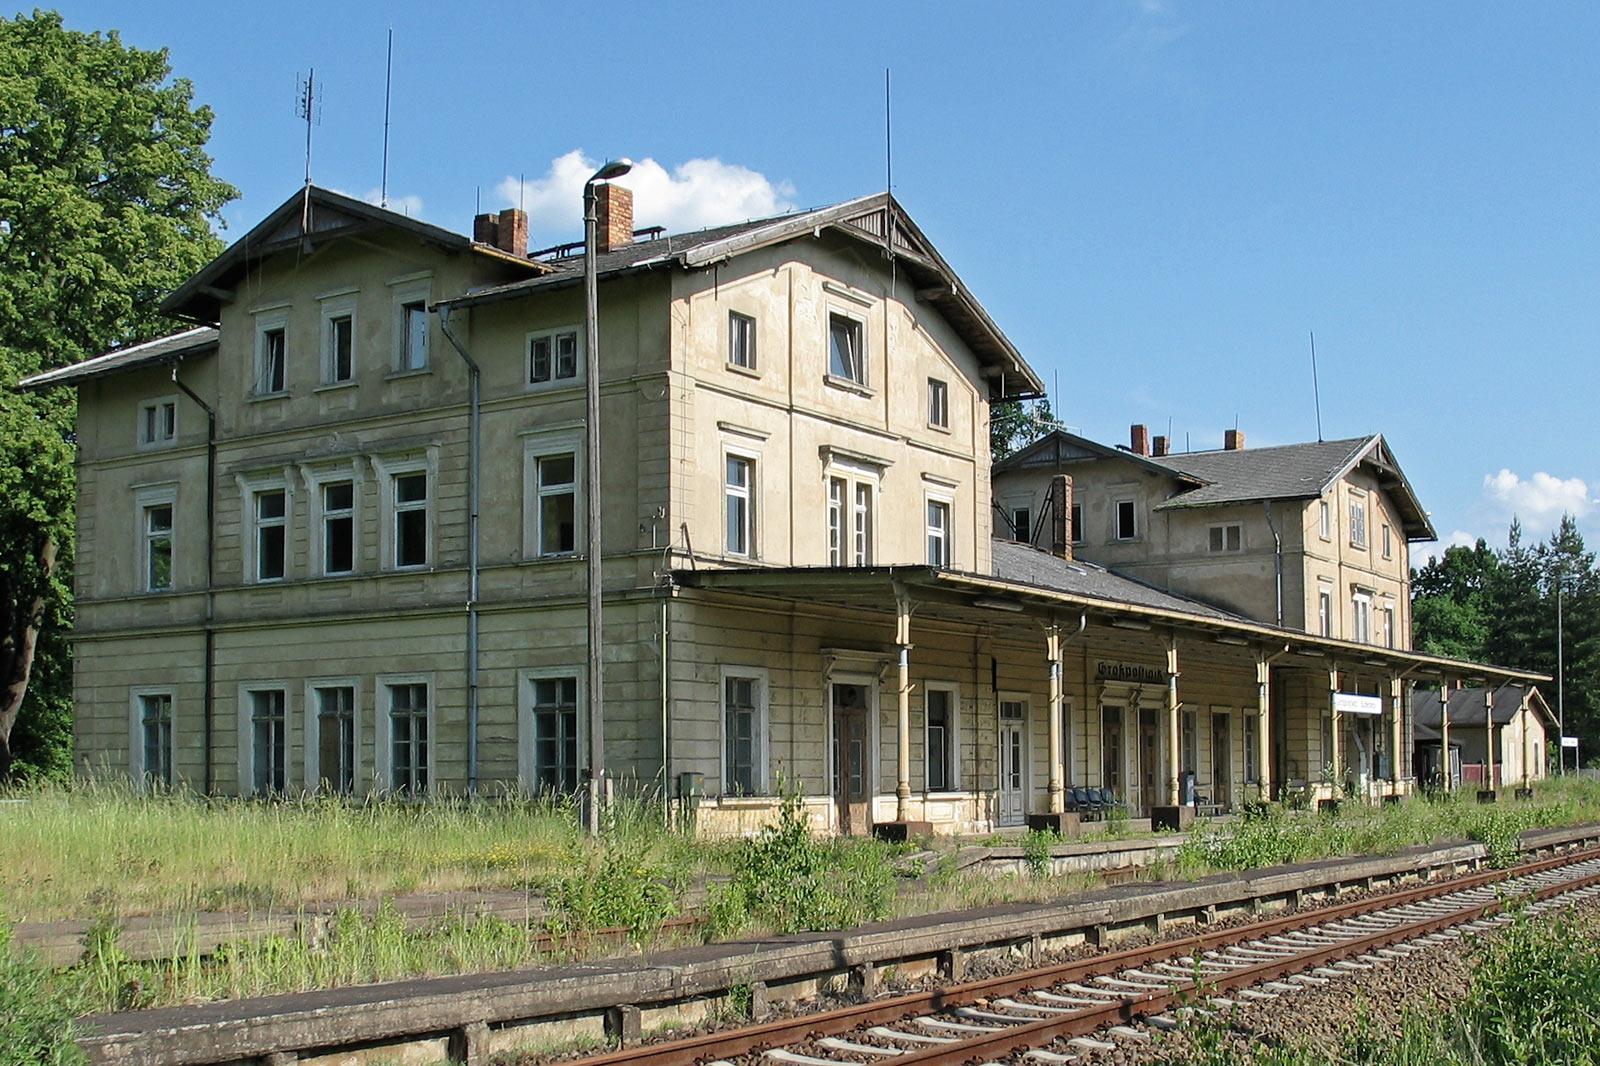 Großpostwitzi vald